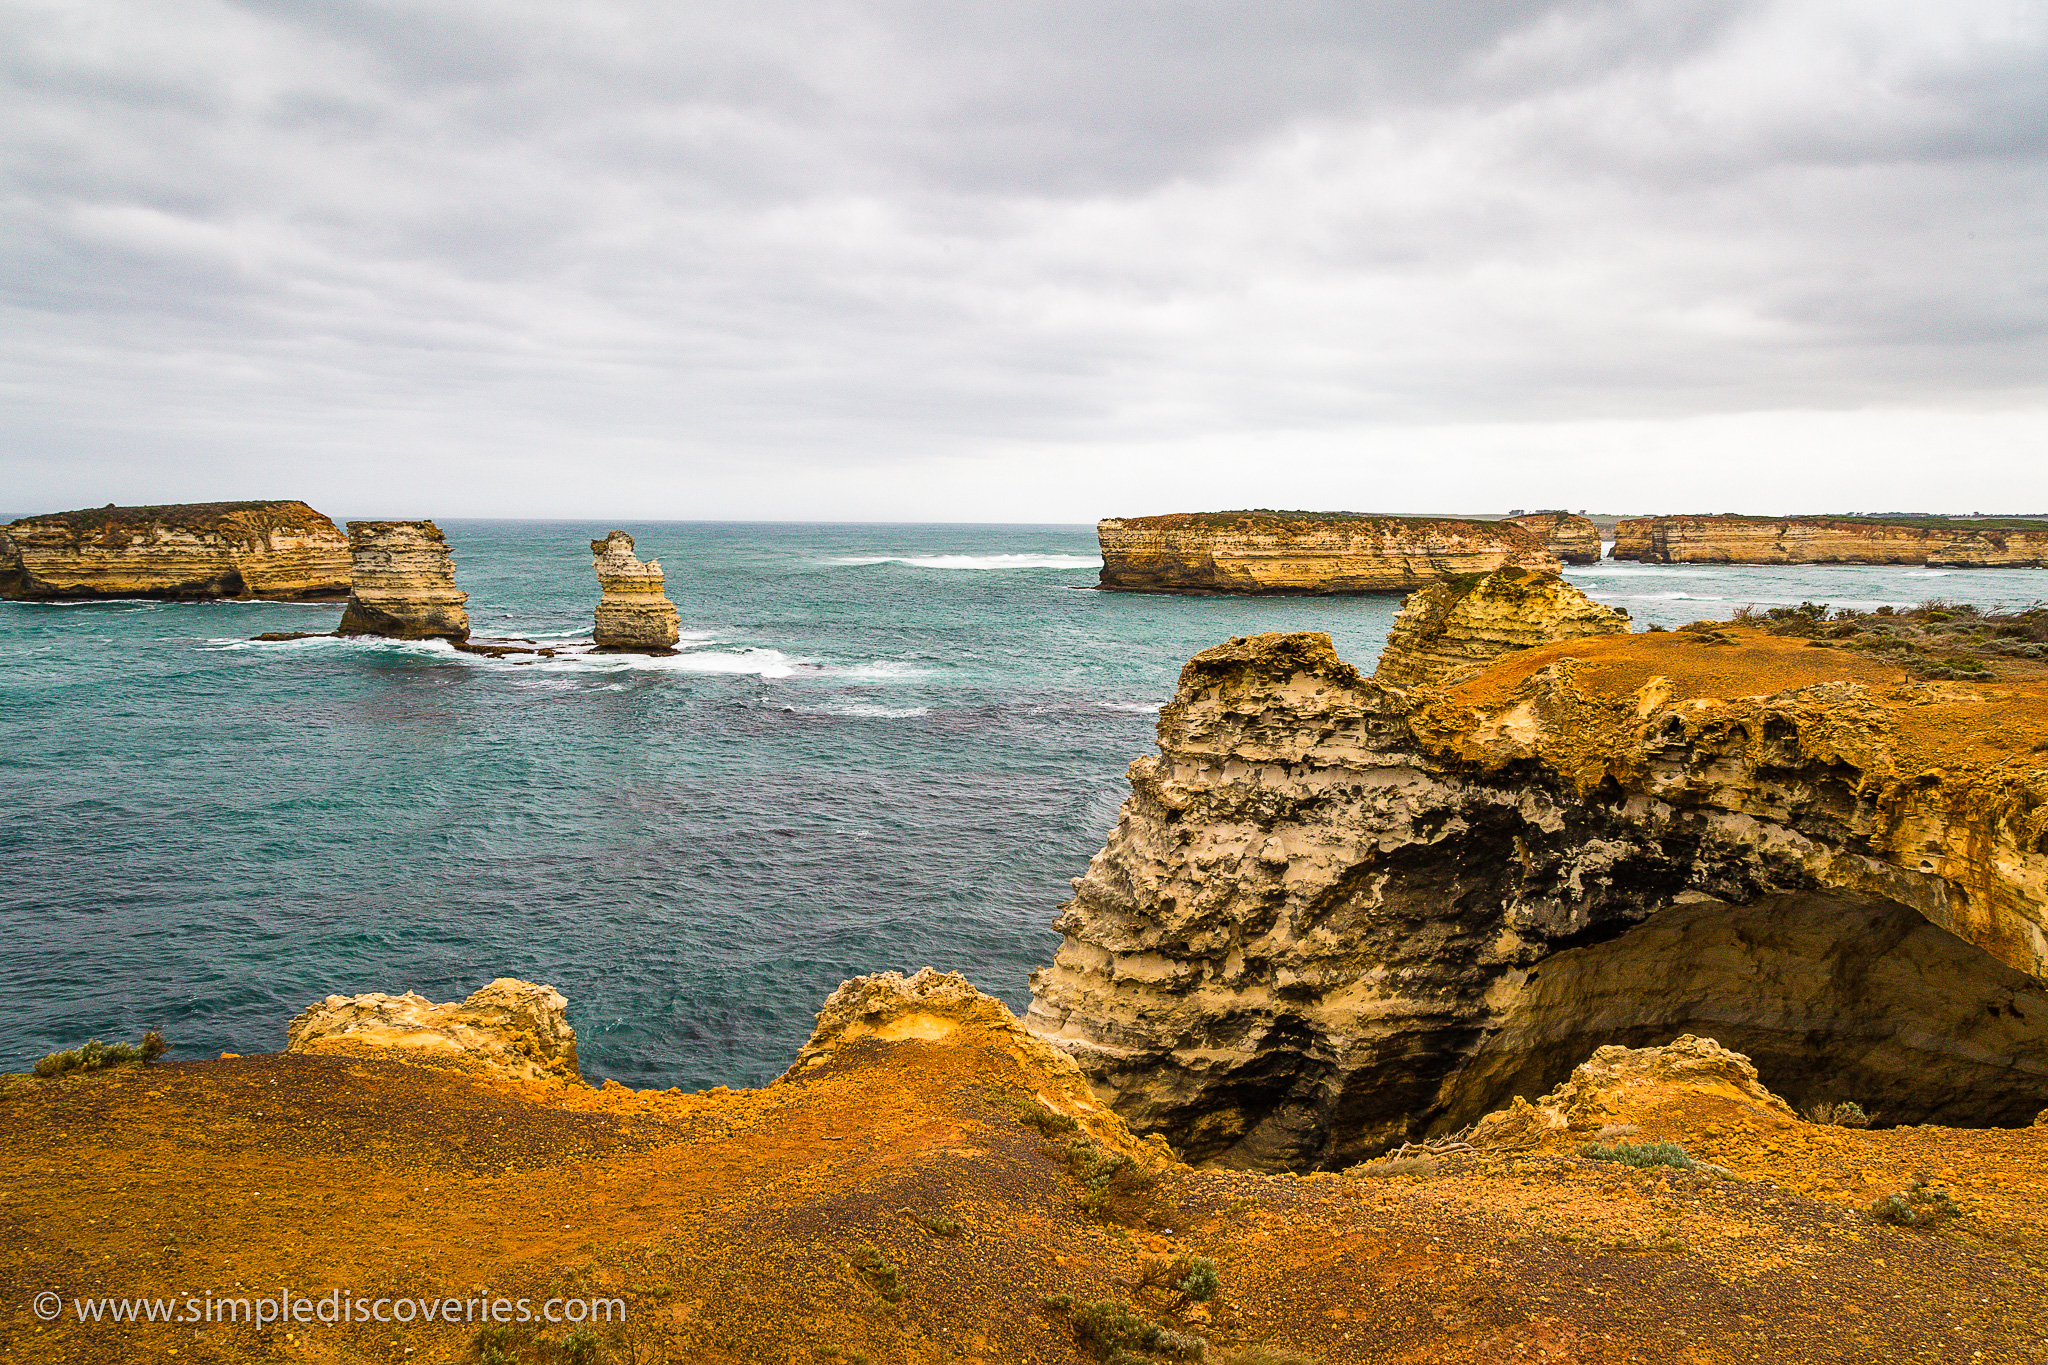 bay_of_islands_australia